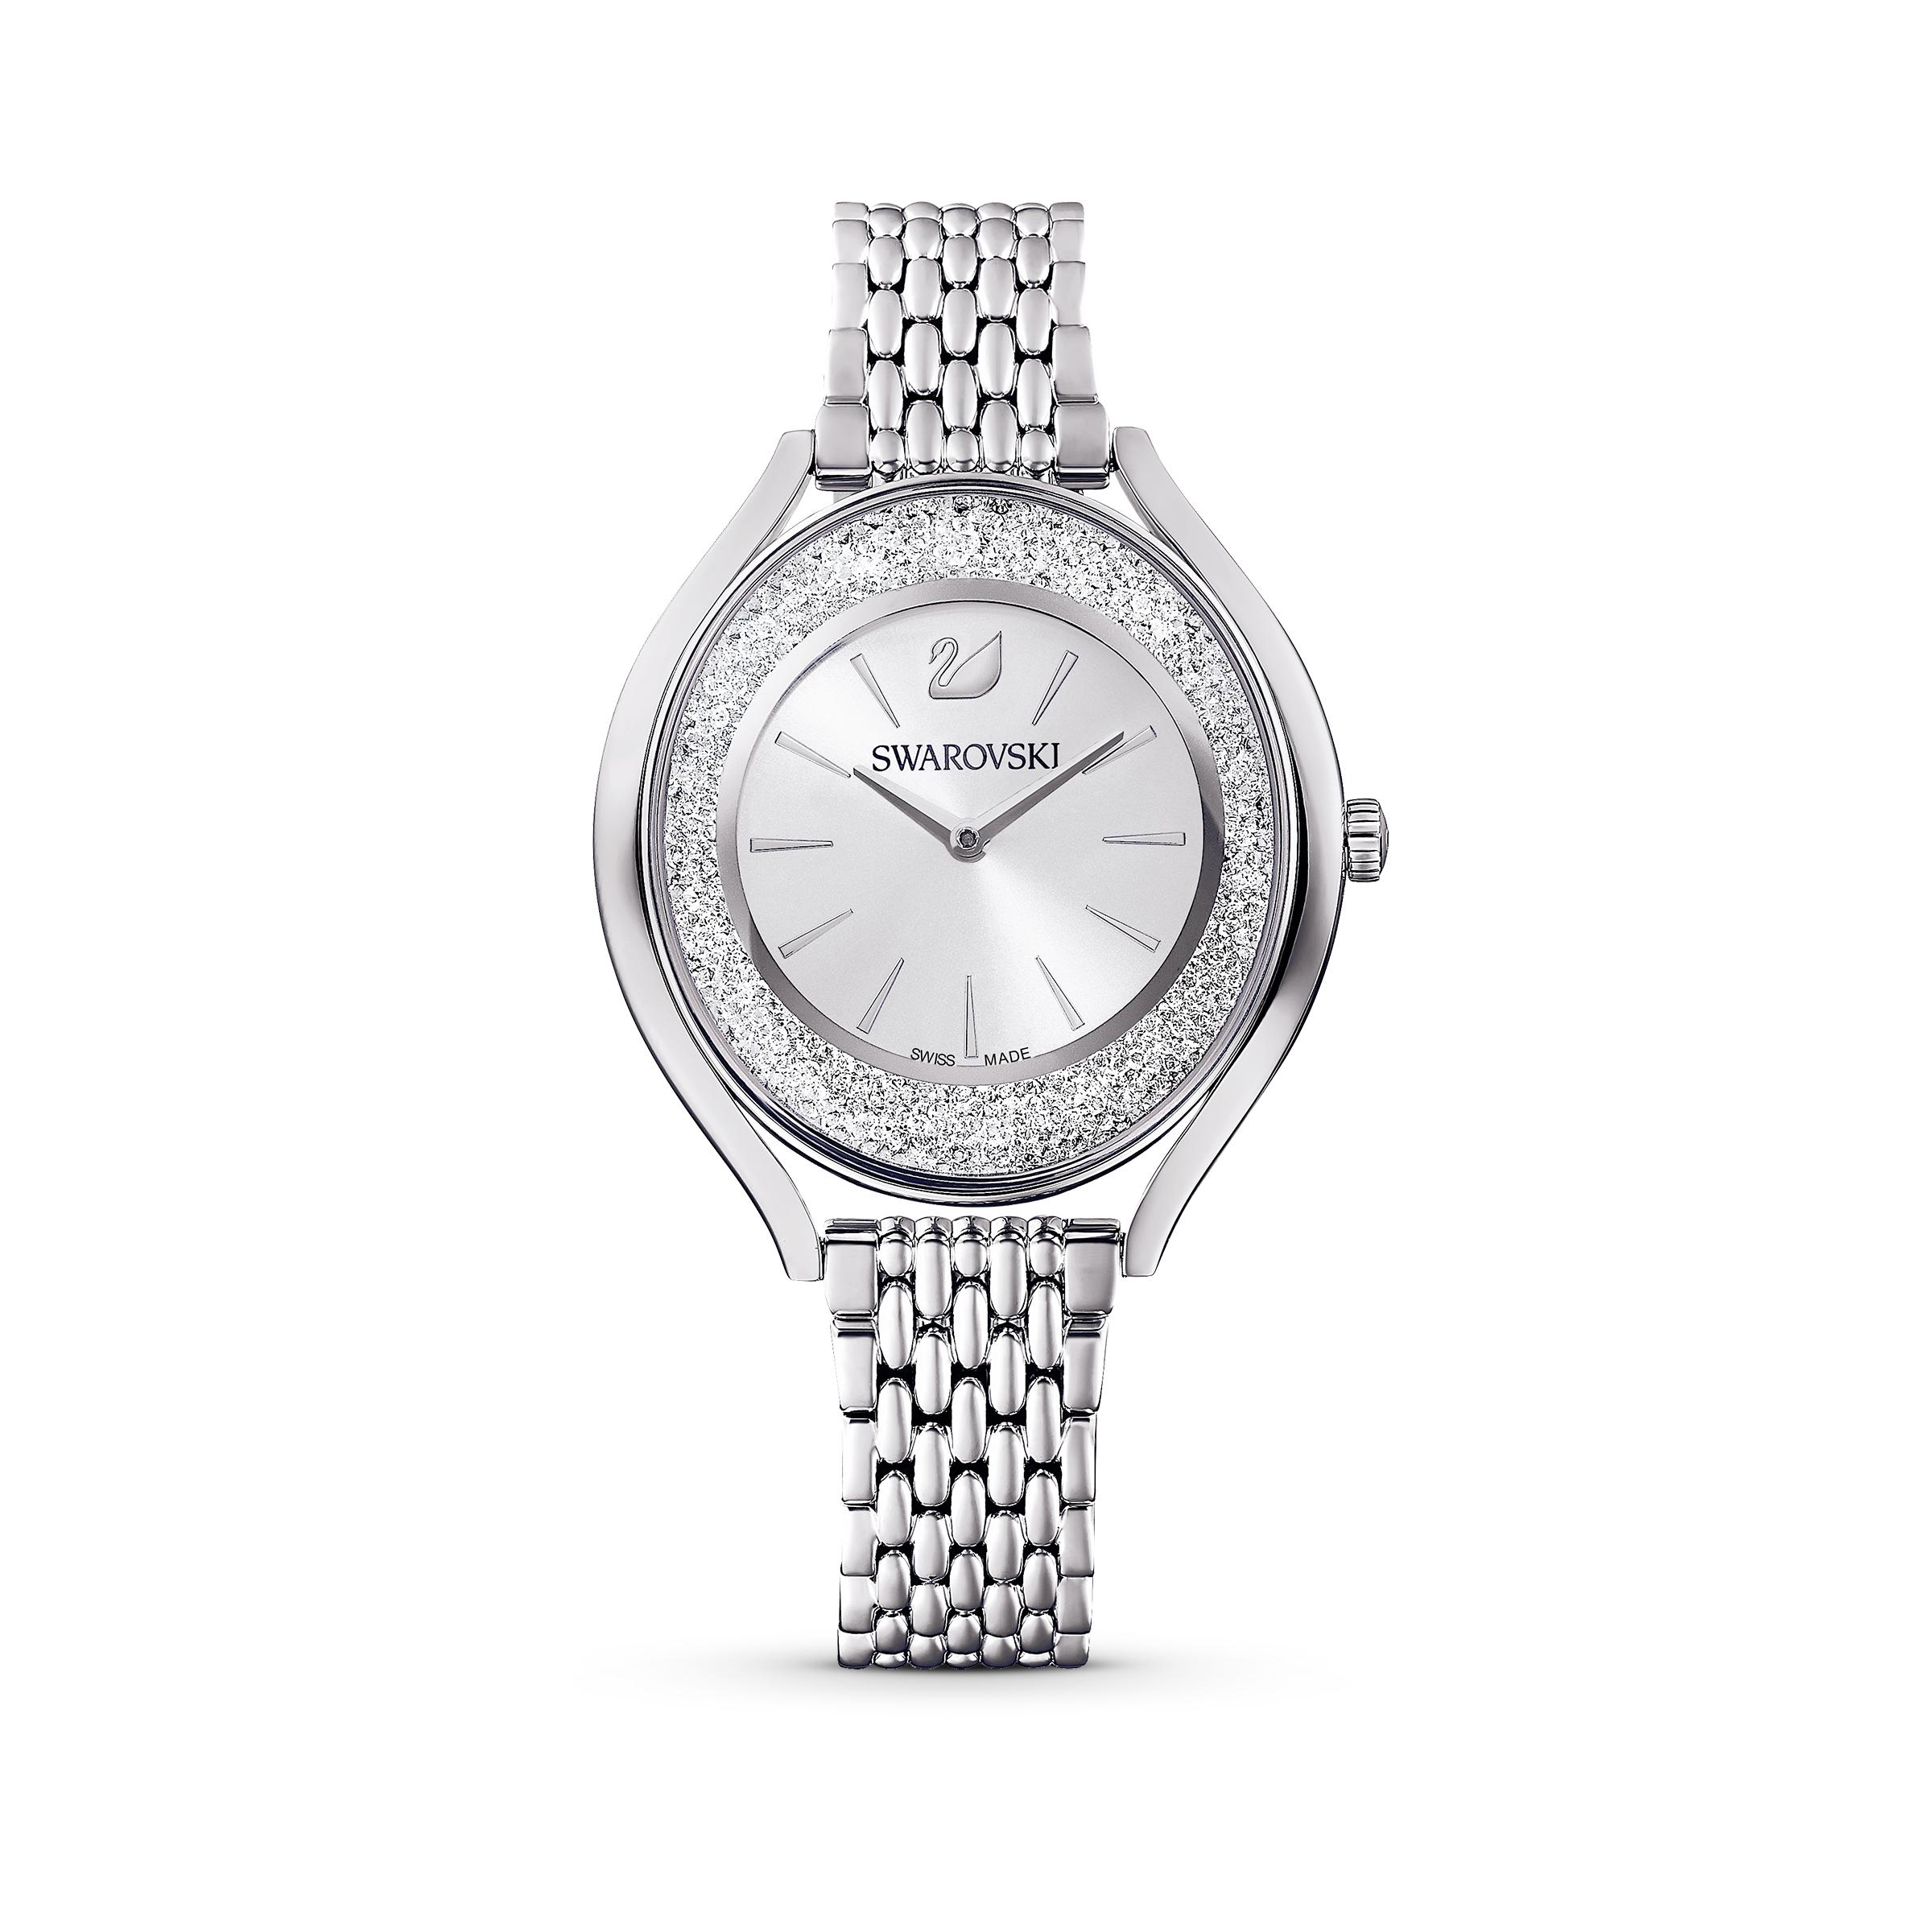 Montre Crystalline Aura, bracelet en métal, ton argenté, acier inoxydable, Swarovski